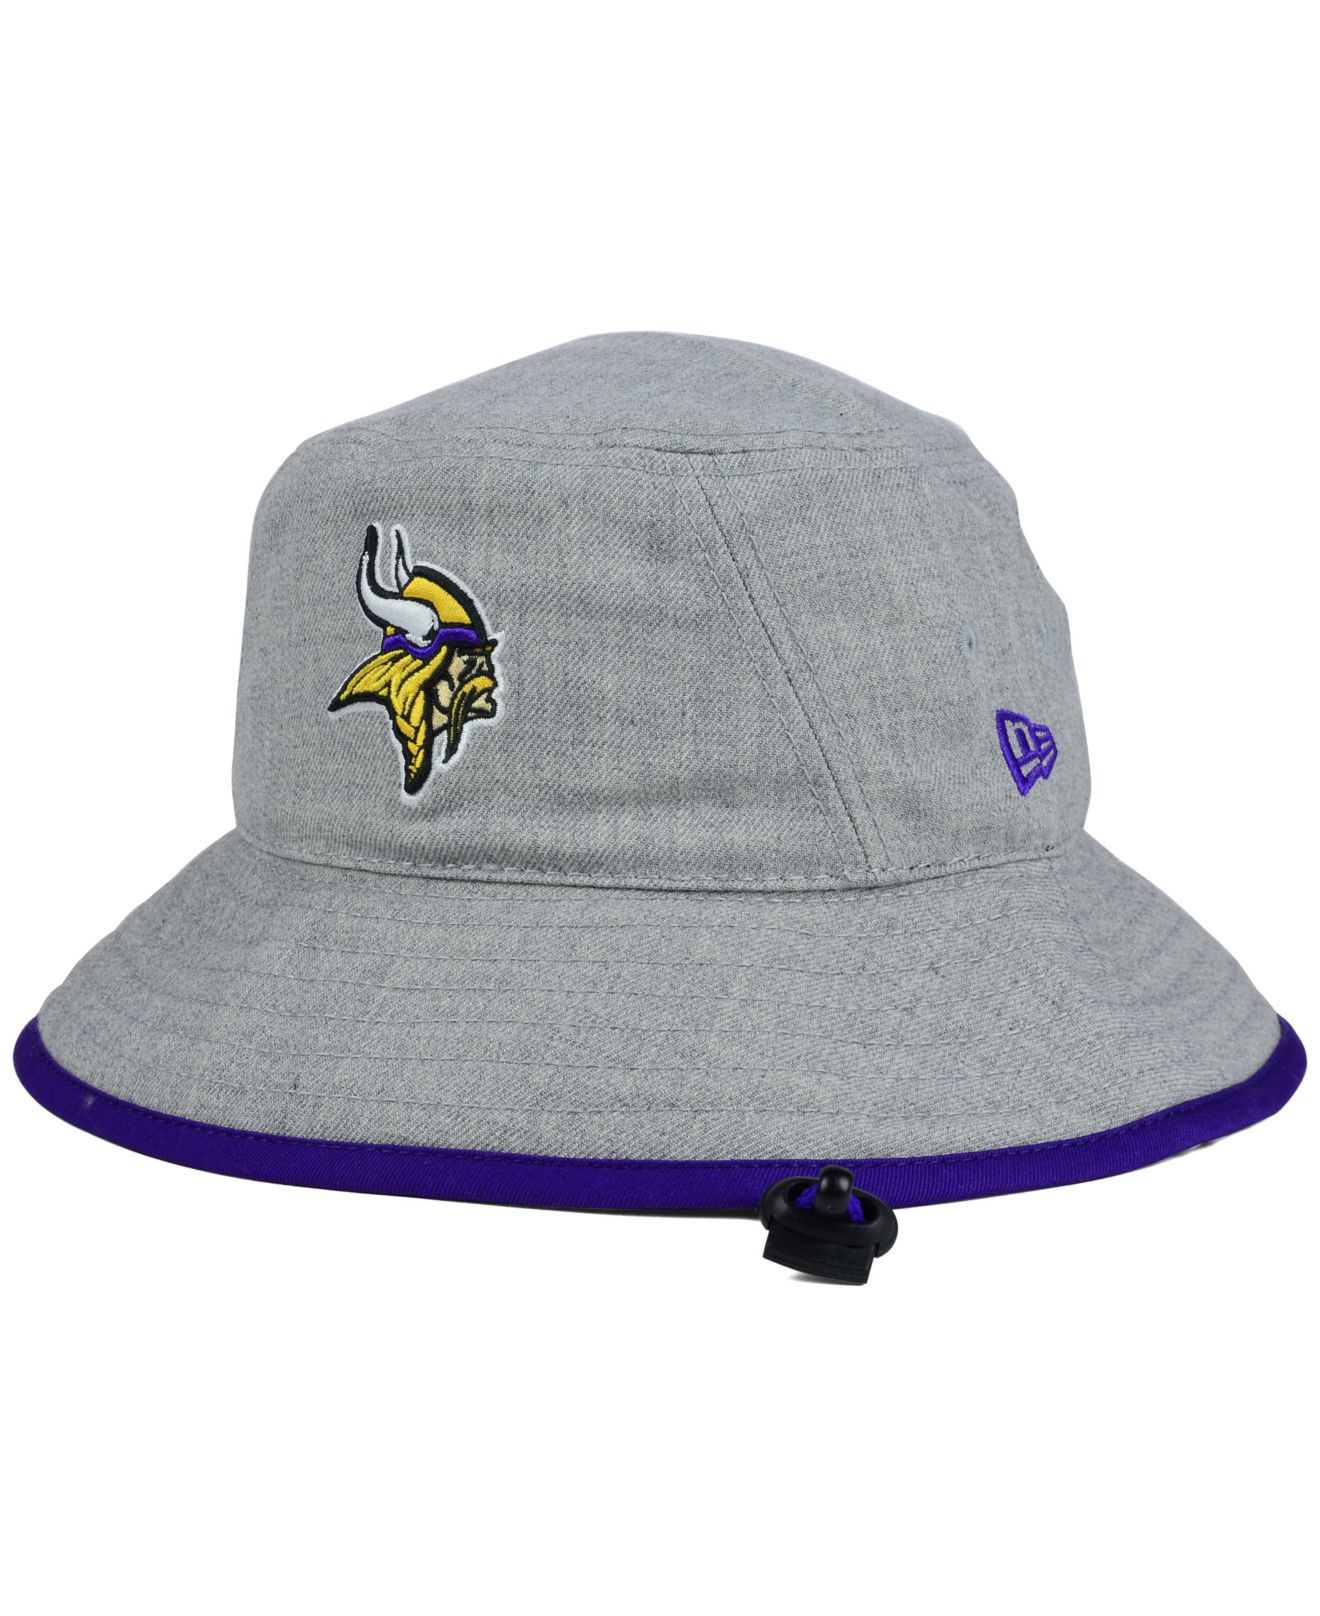 60922018 KTZ Minnesota Vikings Nfl Heather Gray Bucket Hat